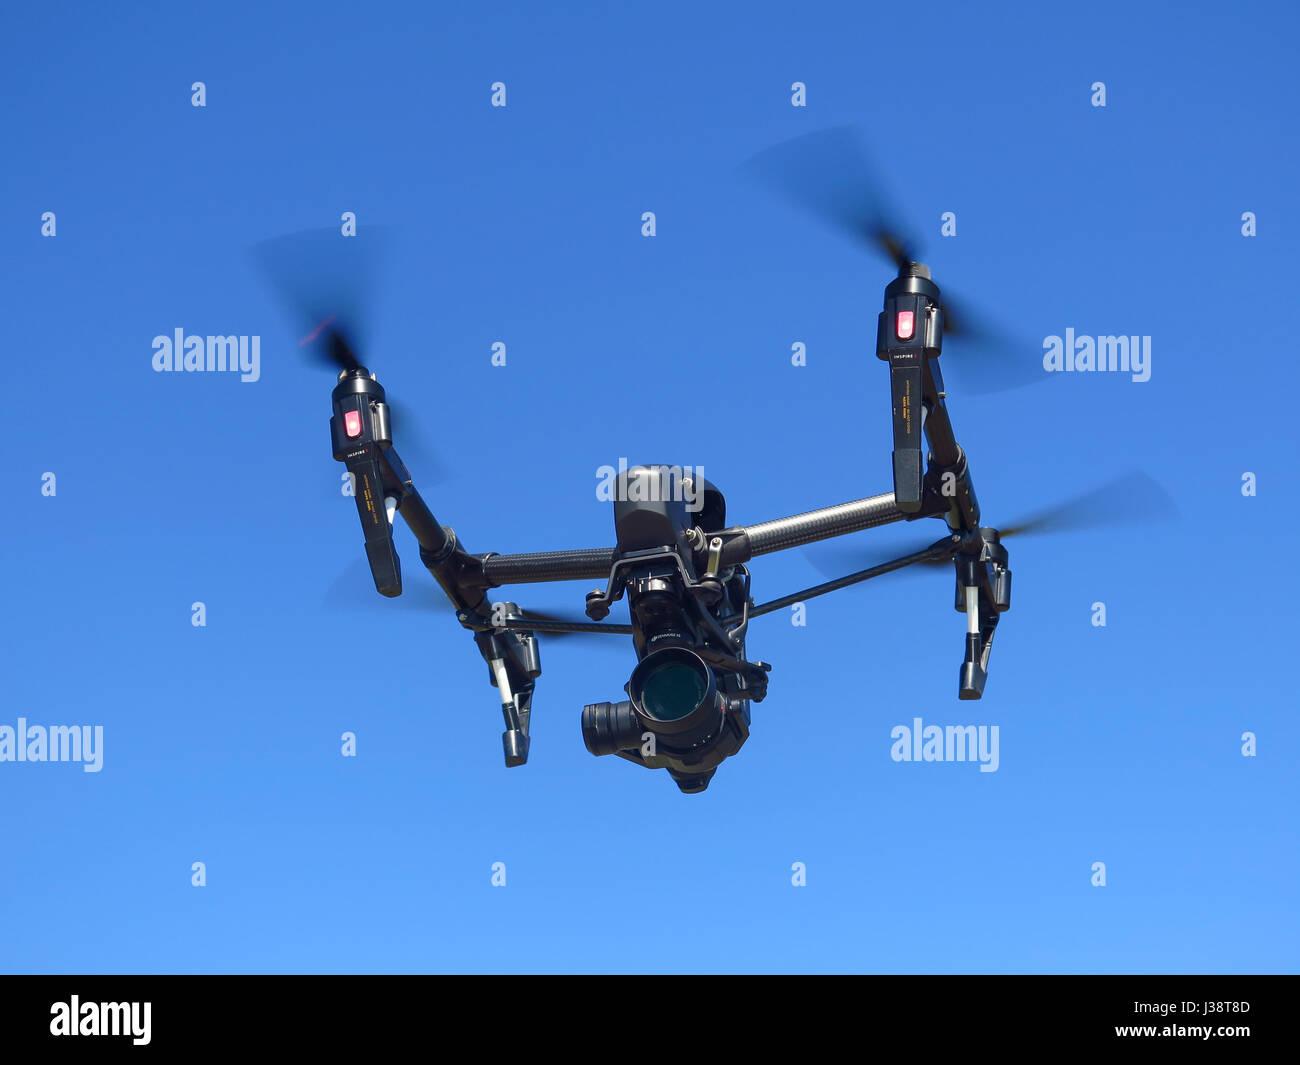 DJI Inspire 1 Pro Black edition drone in flight - Stock Image